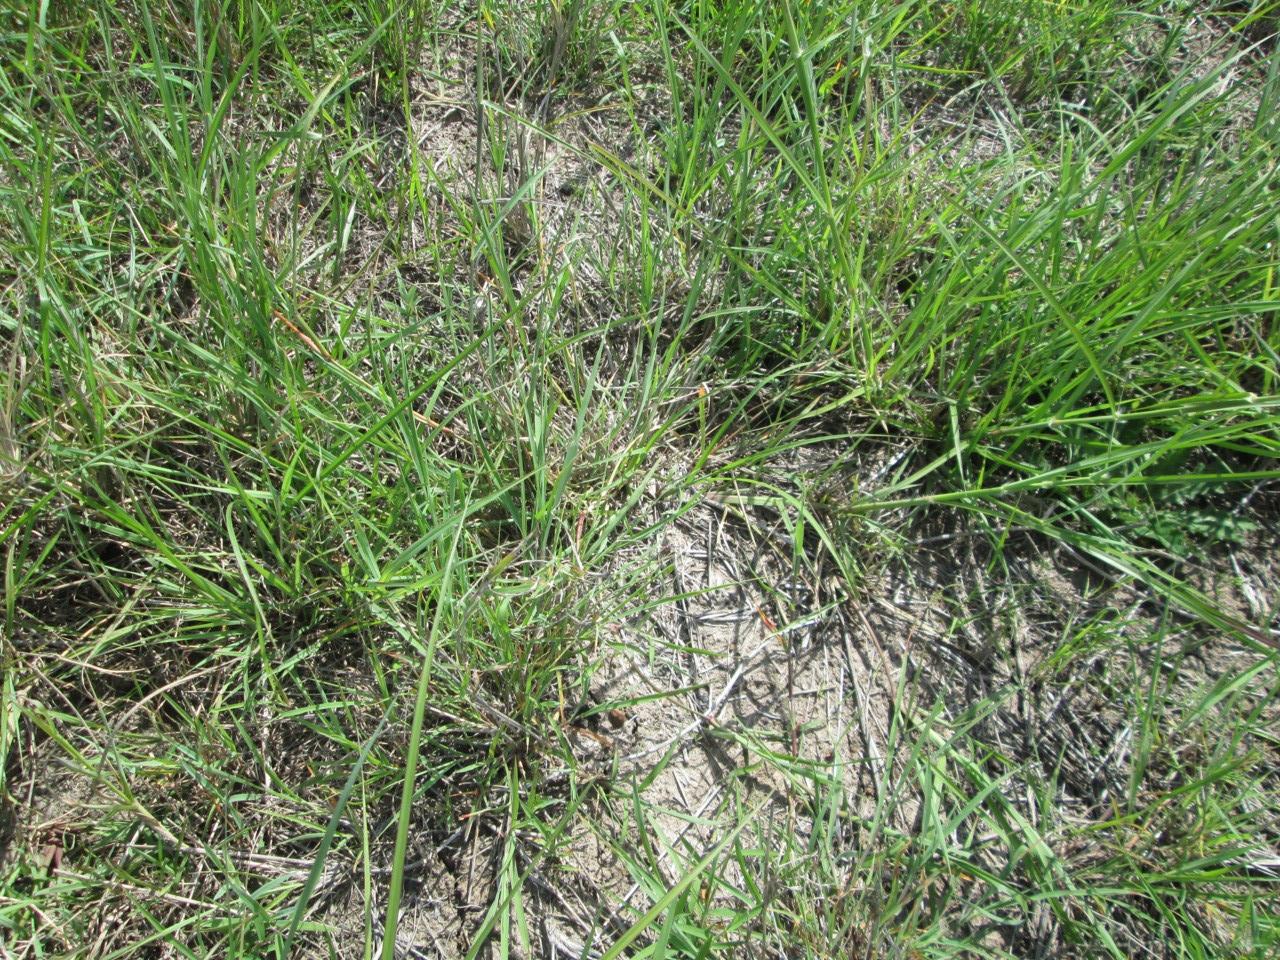 Low density grass